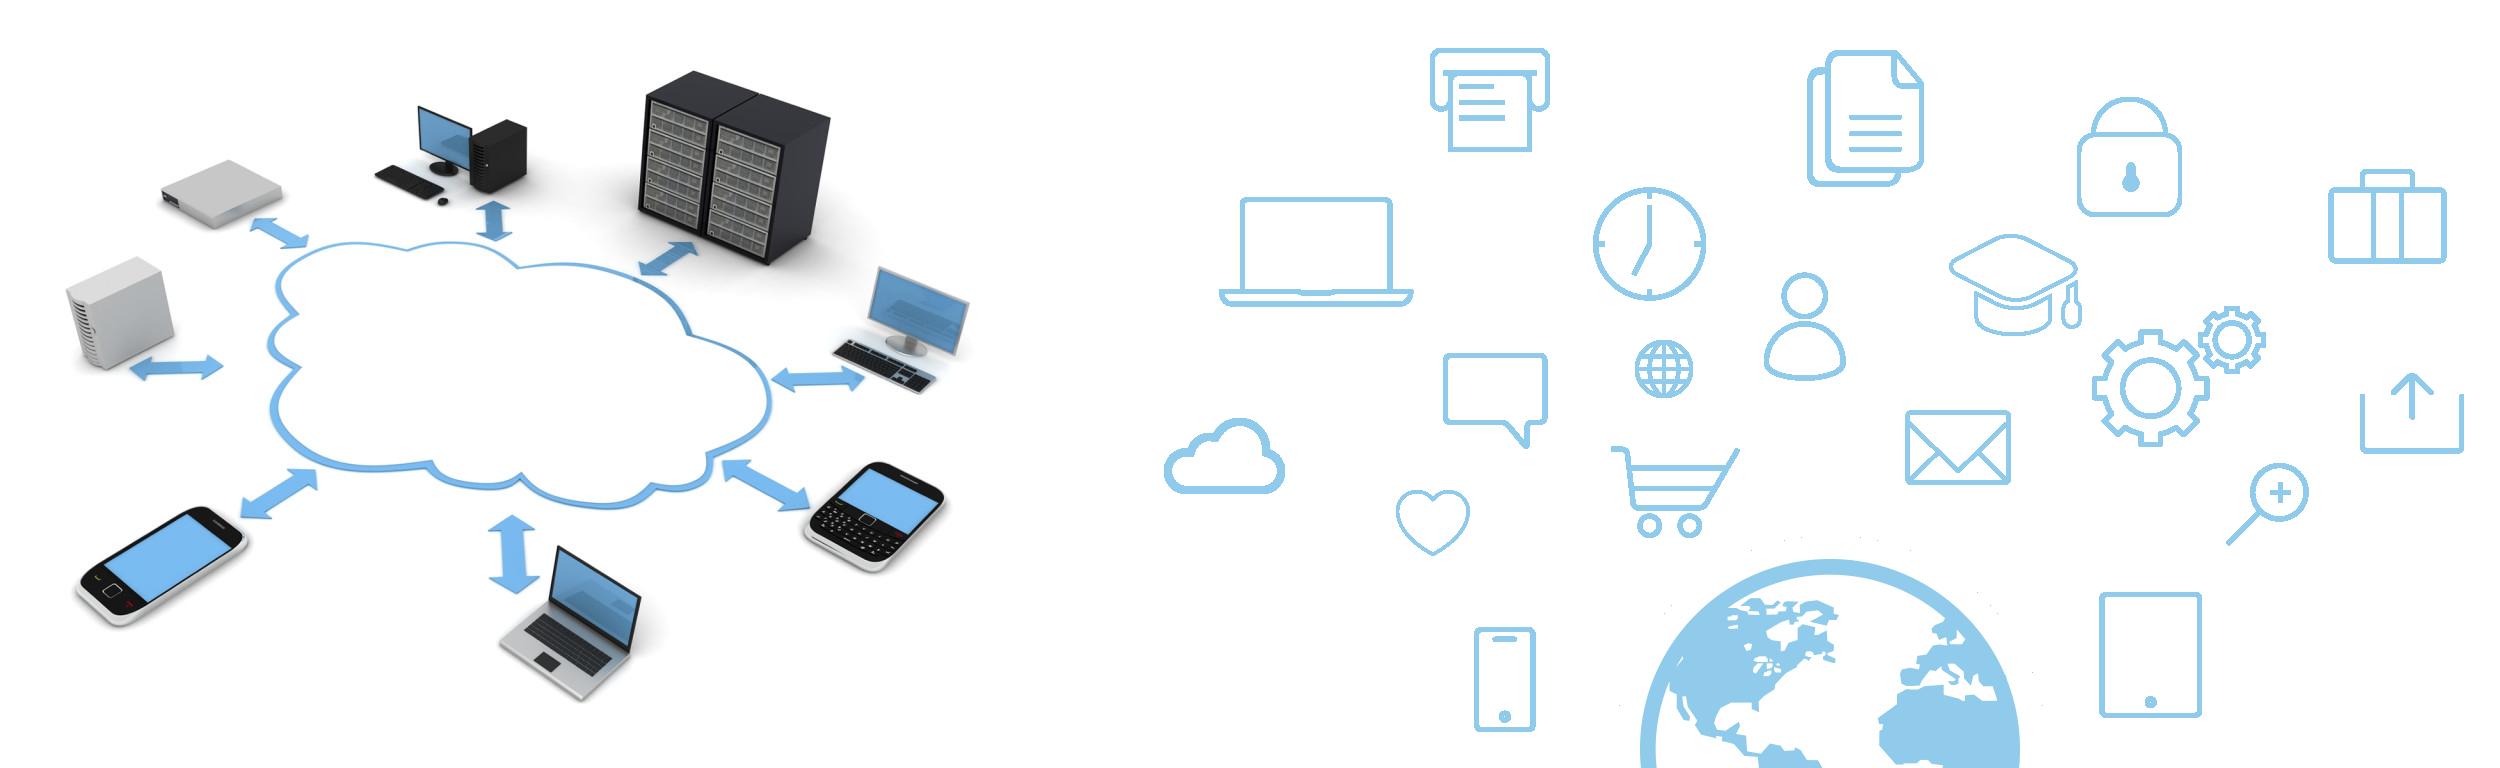 Plataformes de comunicacions